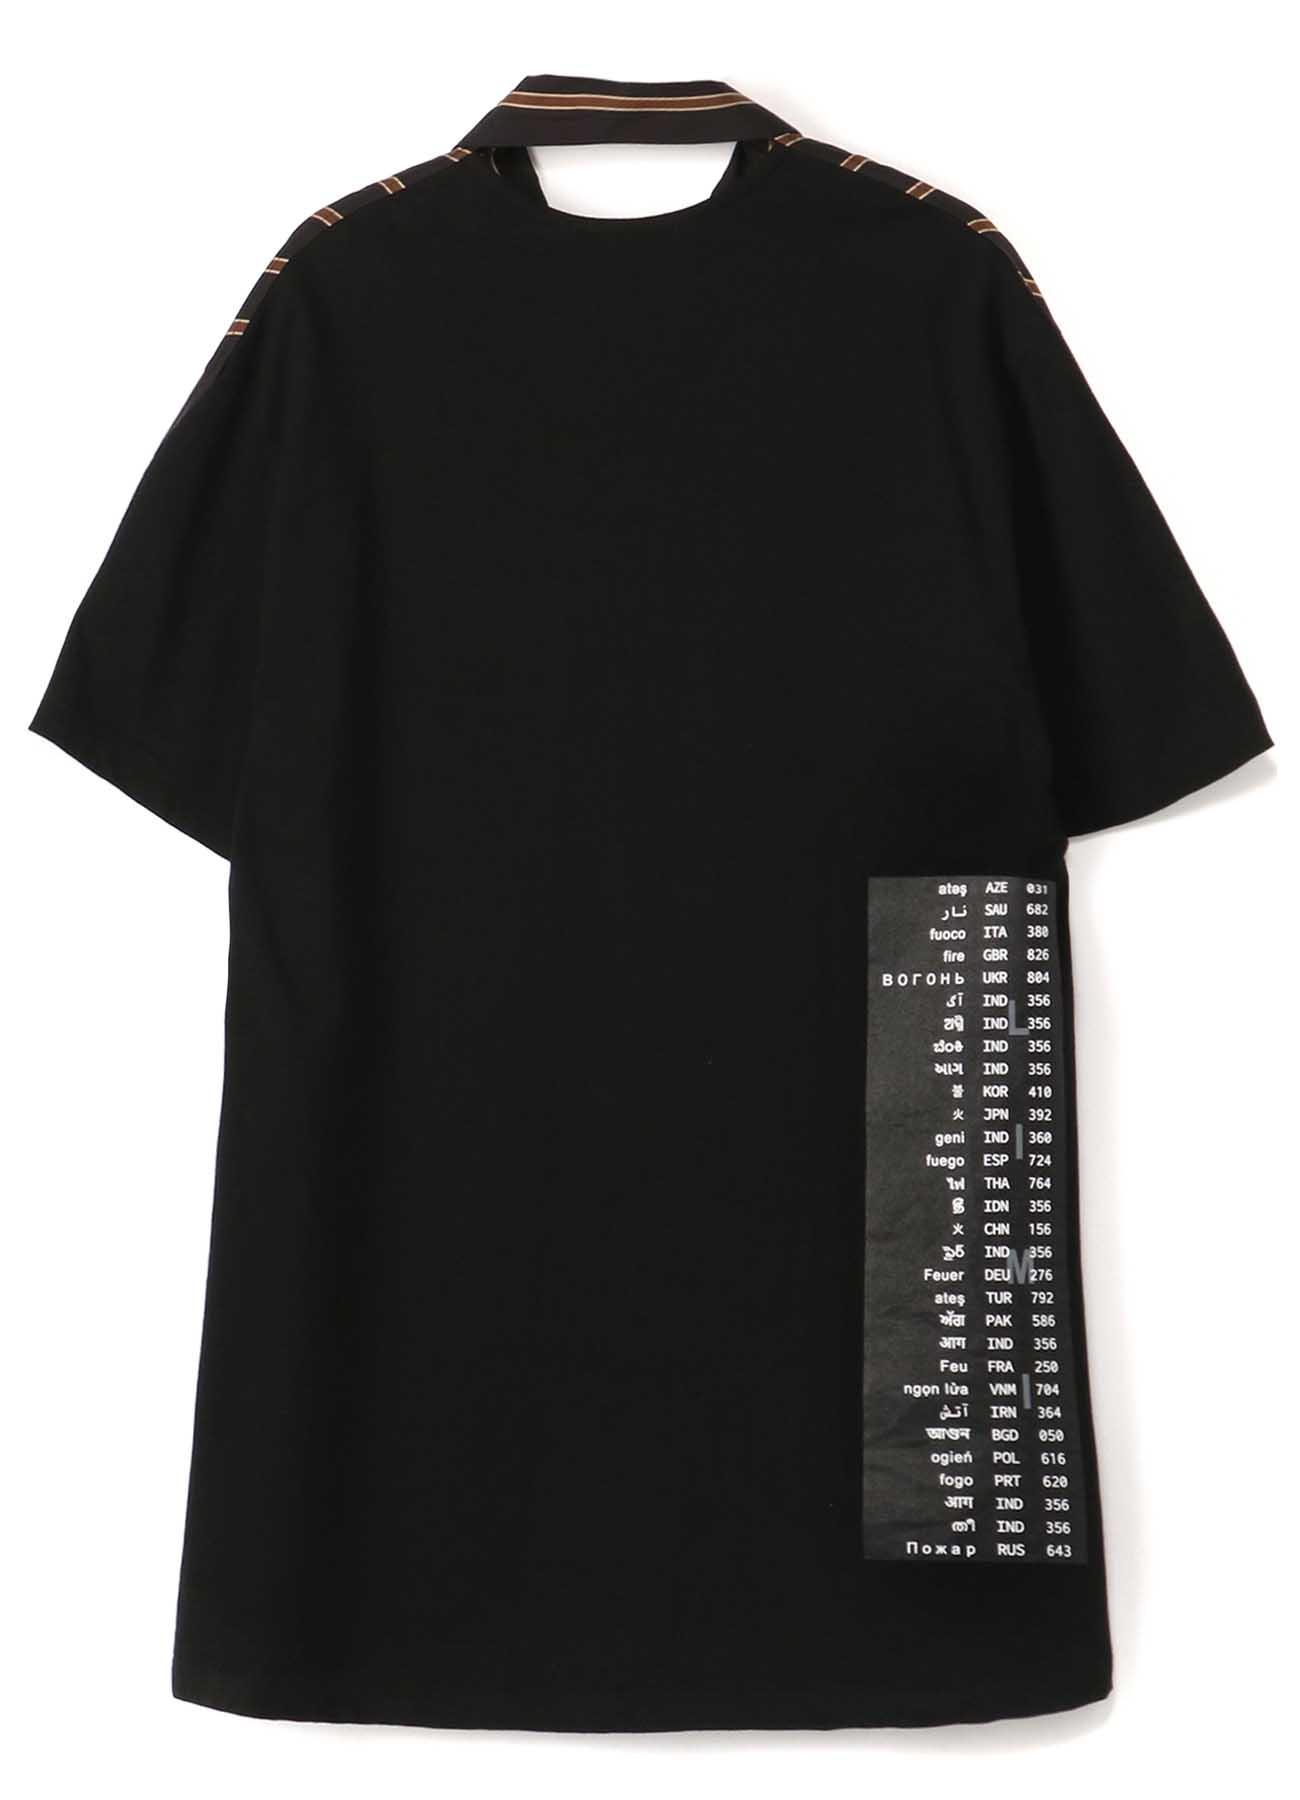 Stripe+feu Print Mix B Docking Shirt Dress